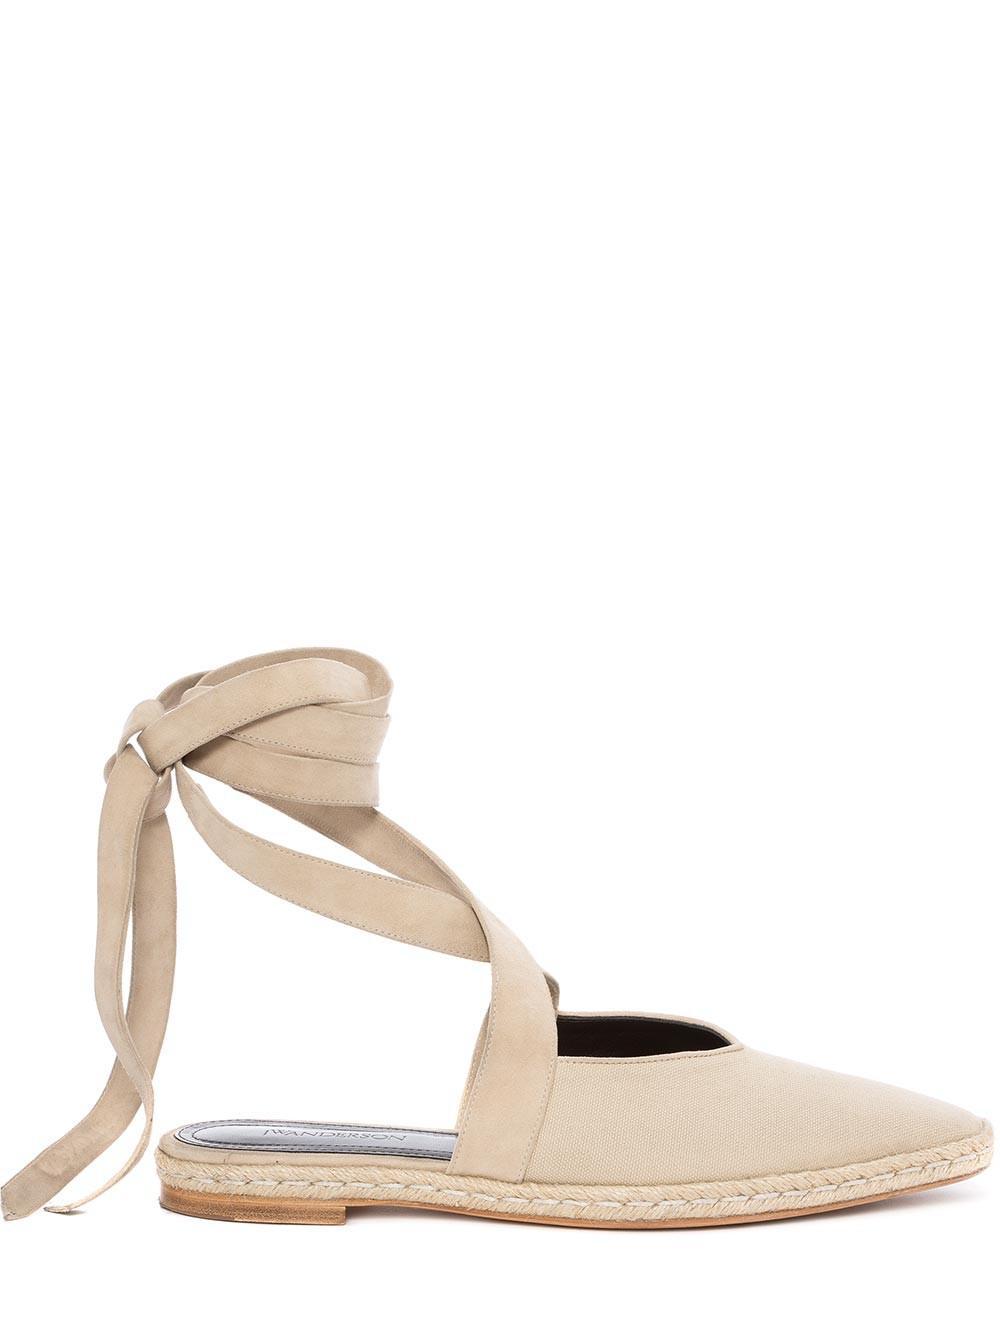 Open Flat Sandals J.W.Anderson bwaYa